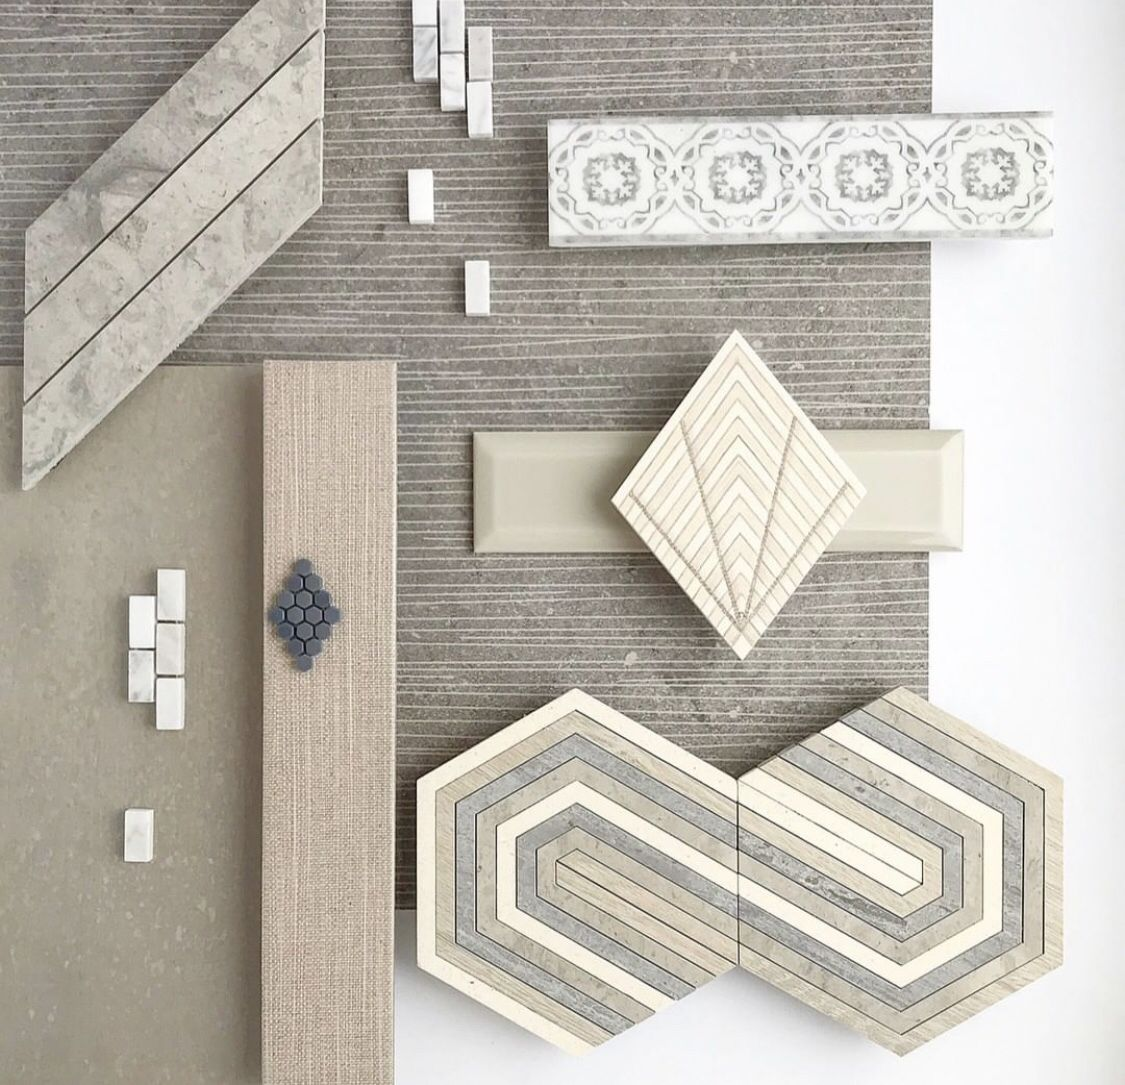 Urban Layer Decorative Tile Marble Systems Inc Materials Board Interior Design Interior Design Boards Tile Inspiration